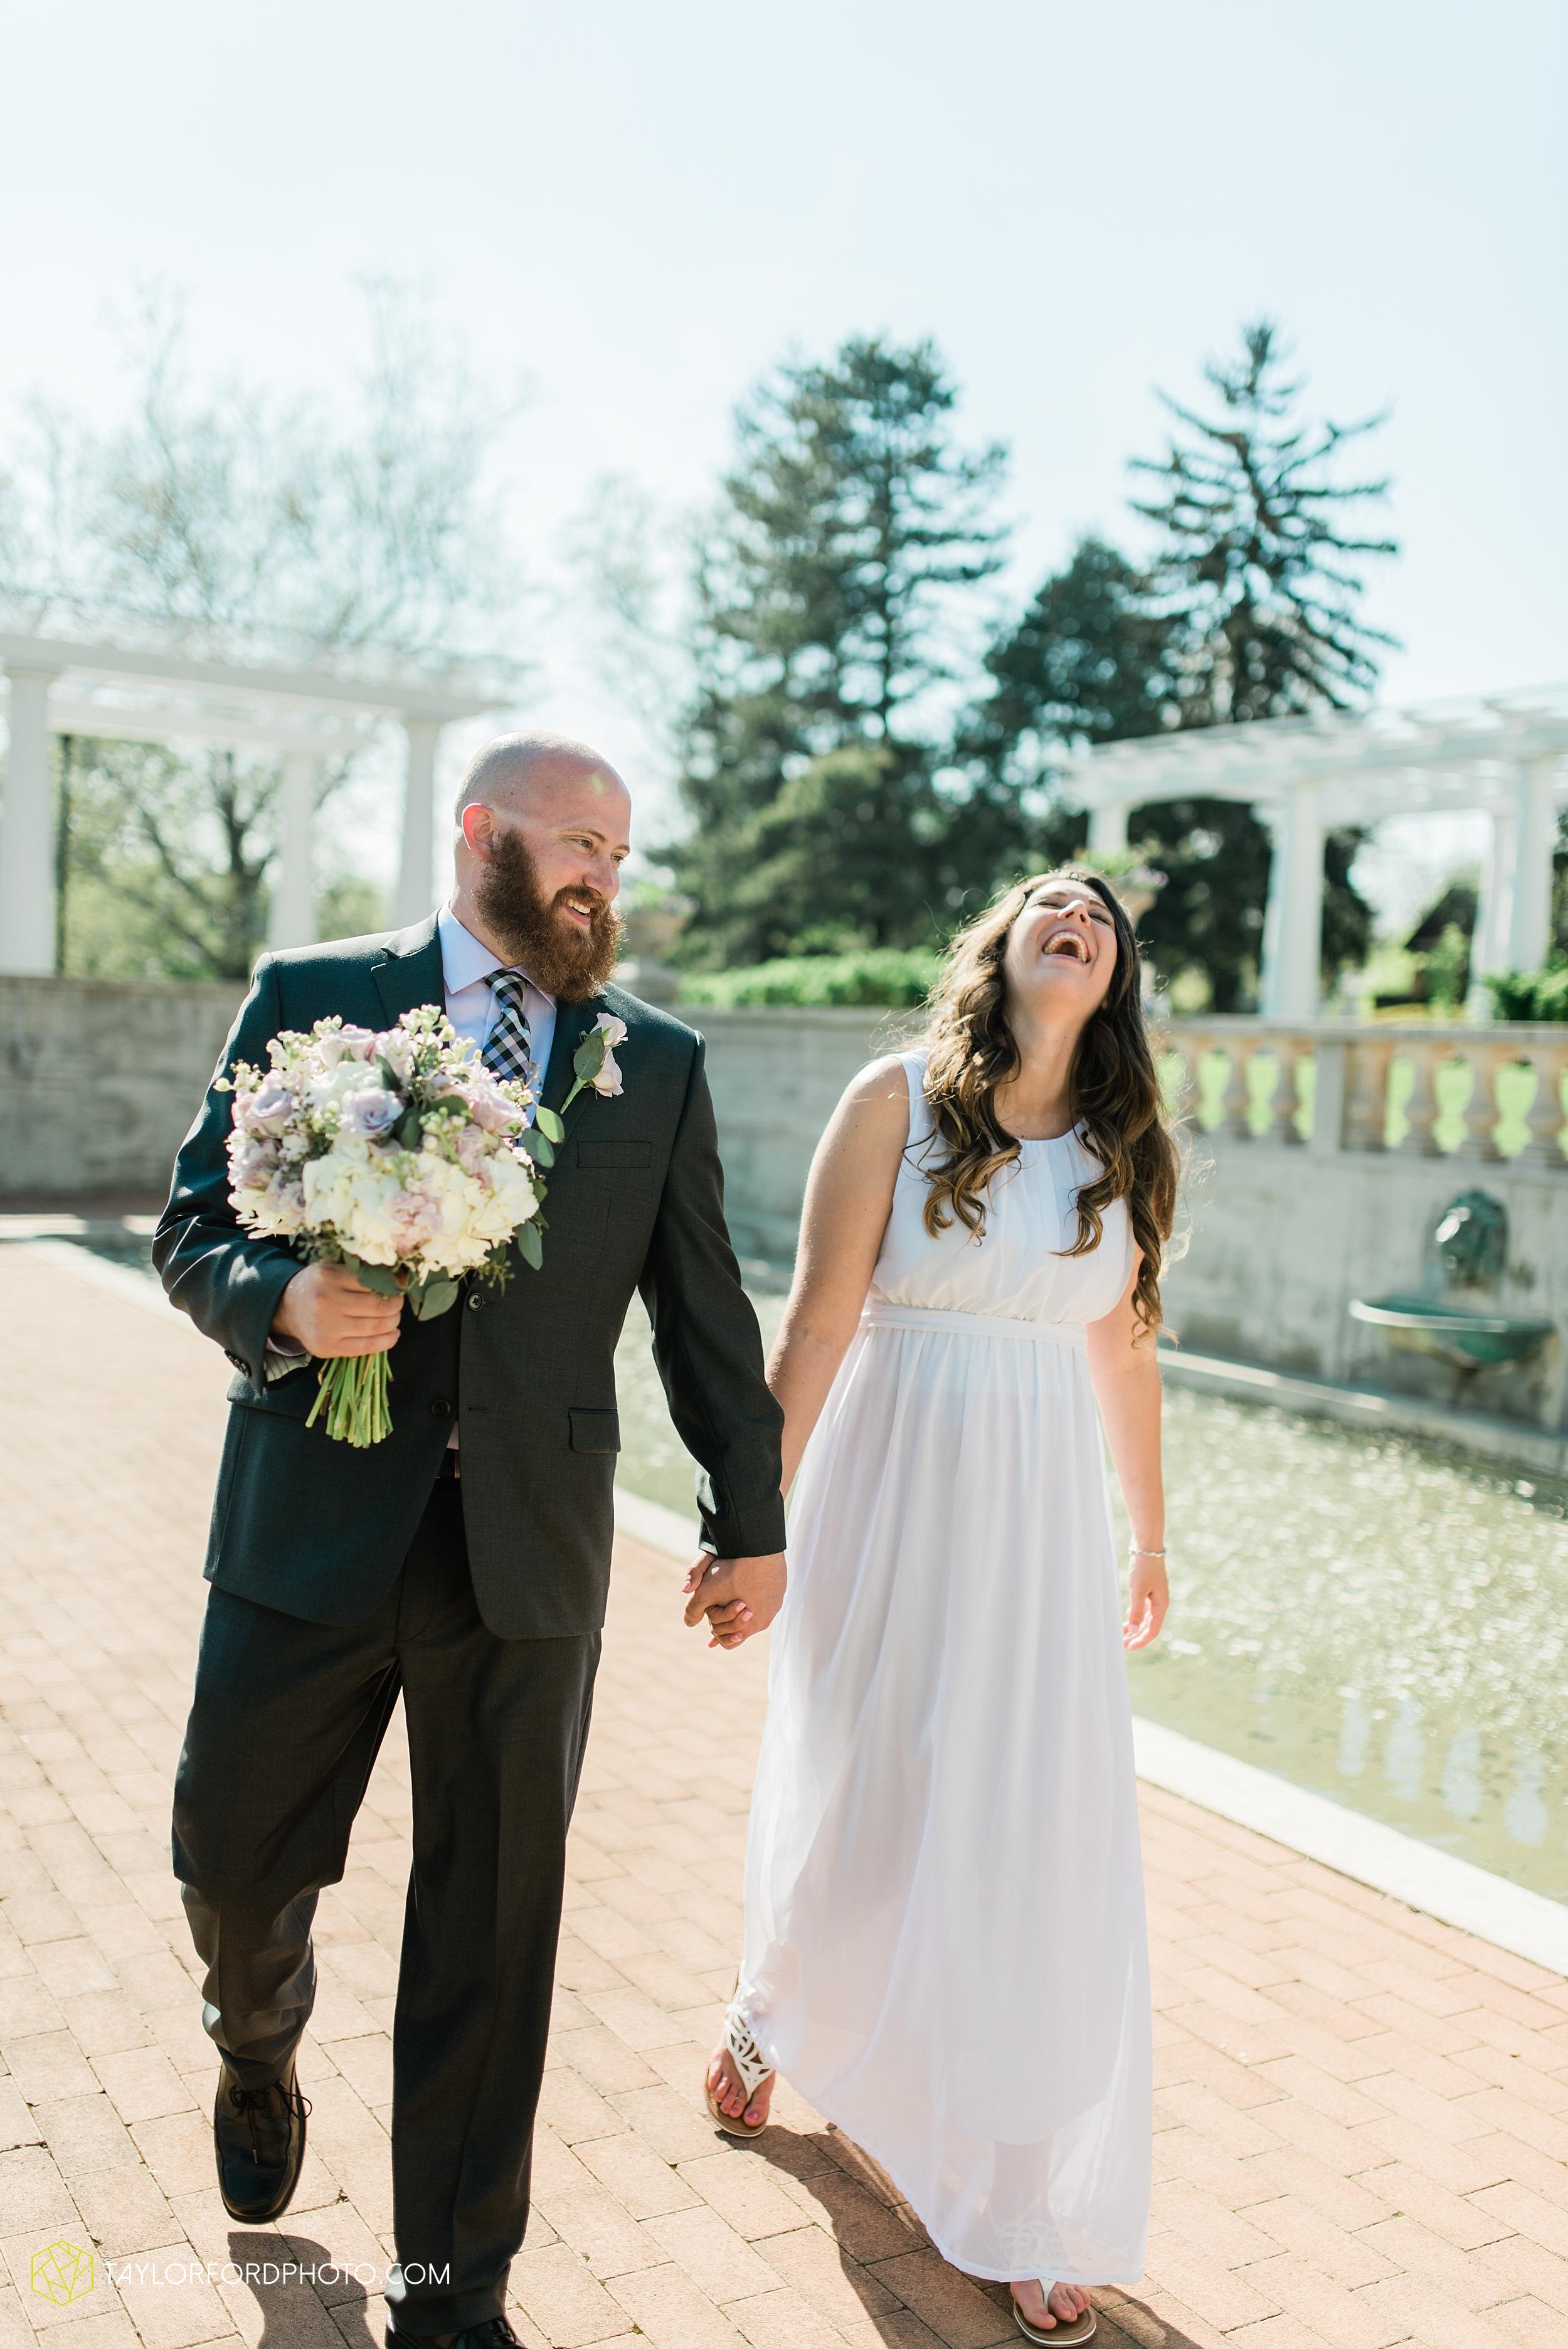 lakeside-rose-gardens-fort-wayne-indiana-elopement-wedding-photographer-Taylor-Ford-Photography_7169.jpg